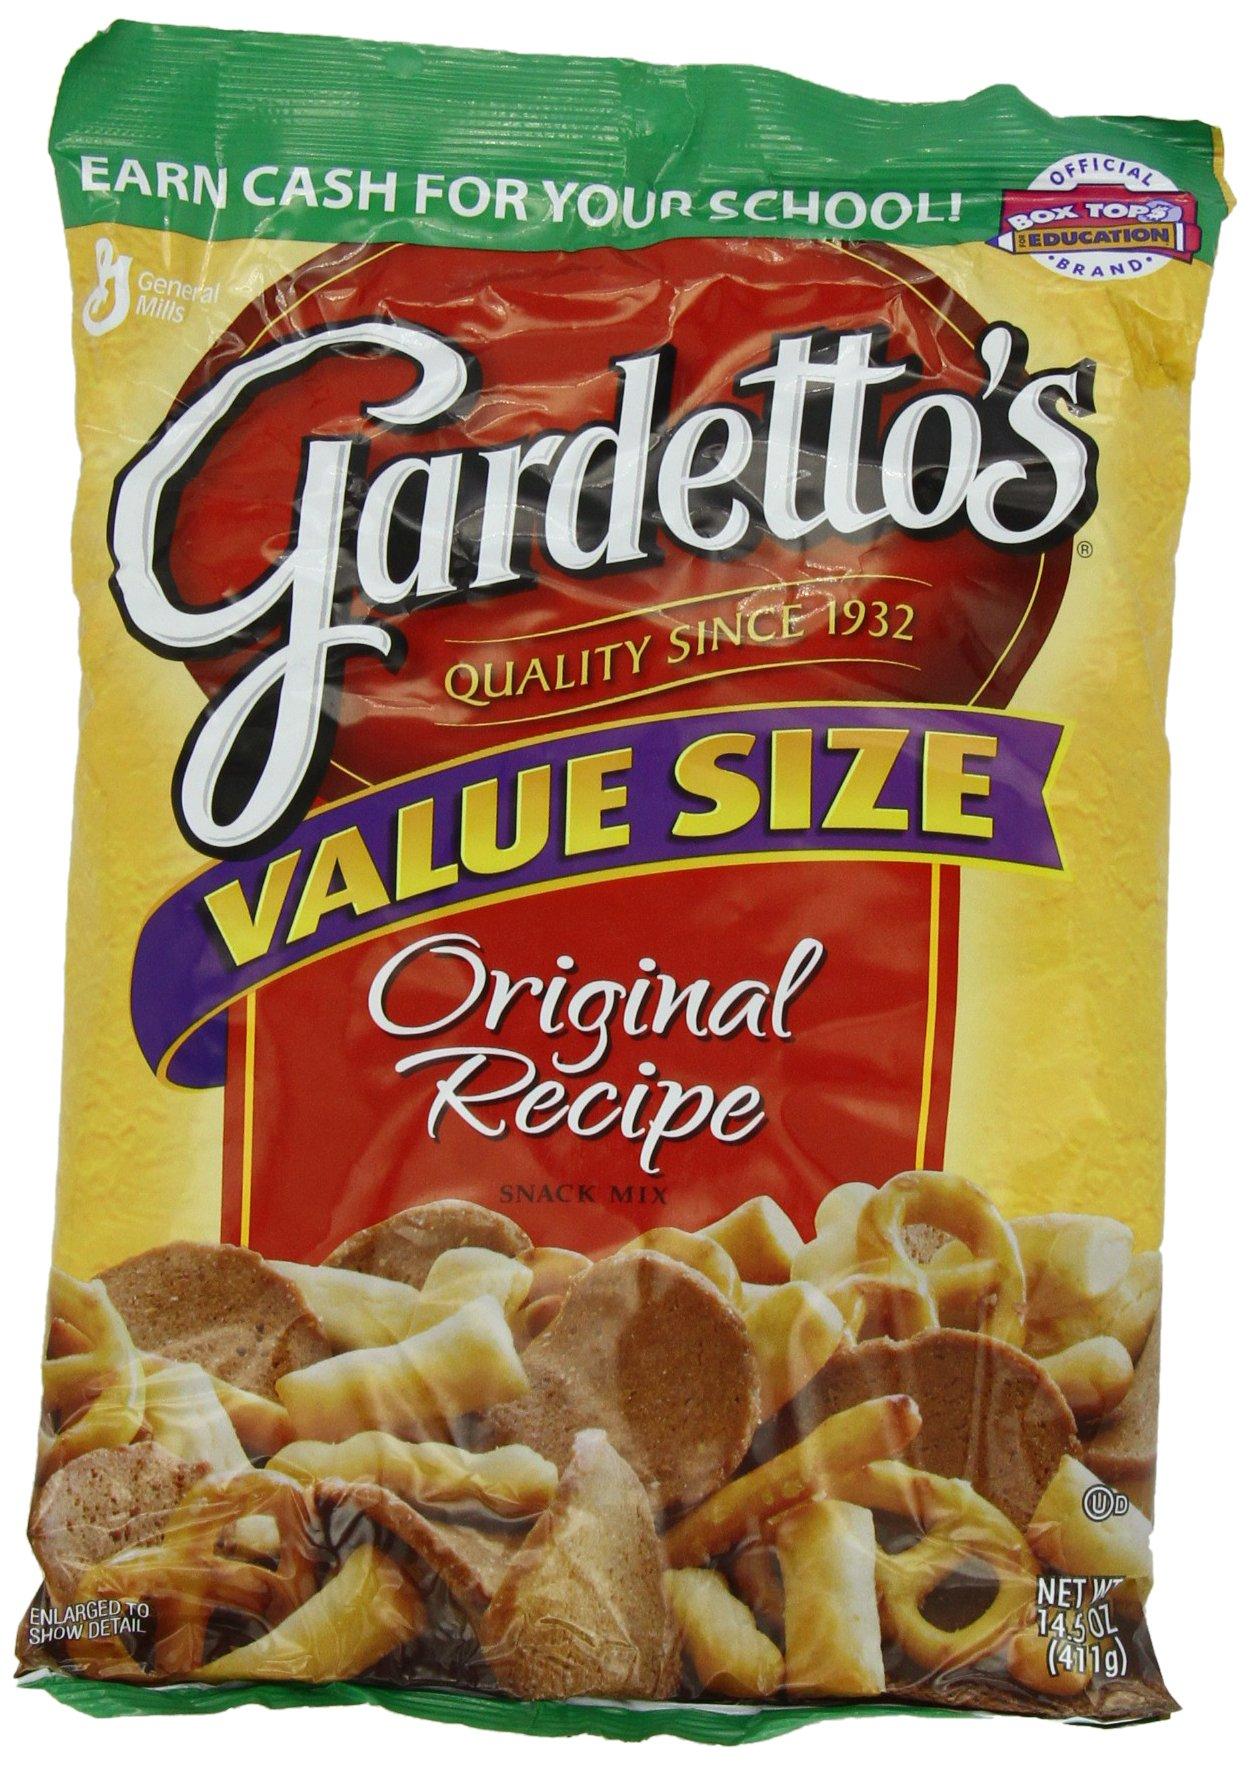 Gardetto's Original Recipe Snack Mix 14.5 Ounce. Bag (Pack of 4)